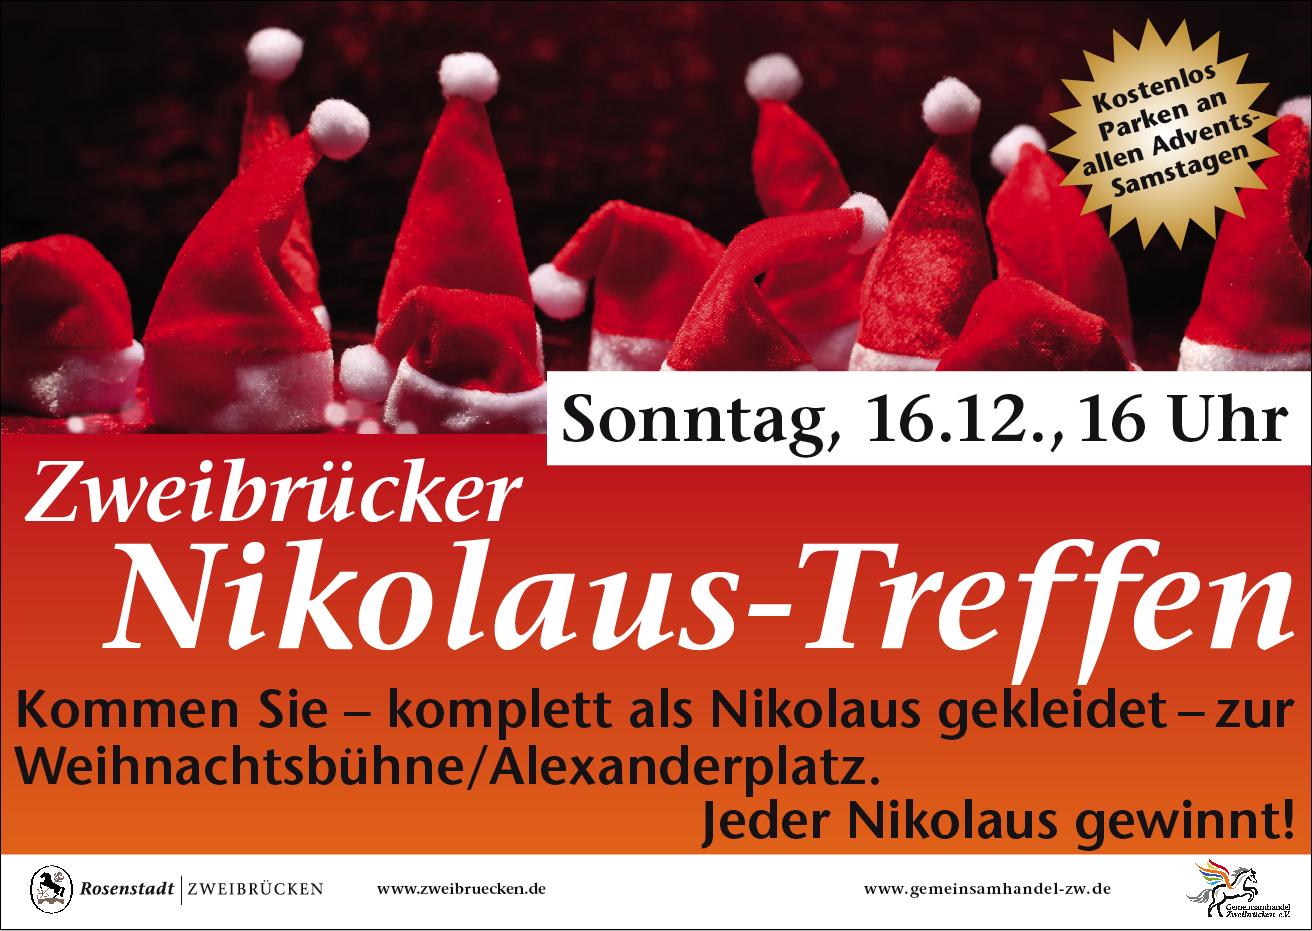 Großes Zweibrücker Nikolaustreffen